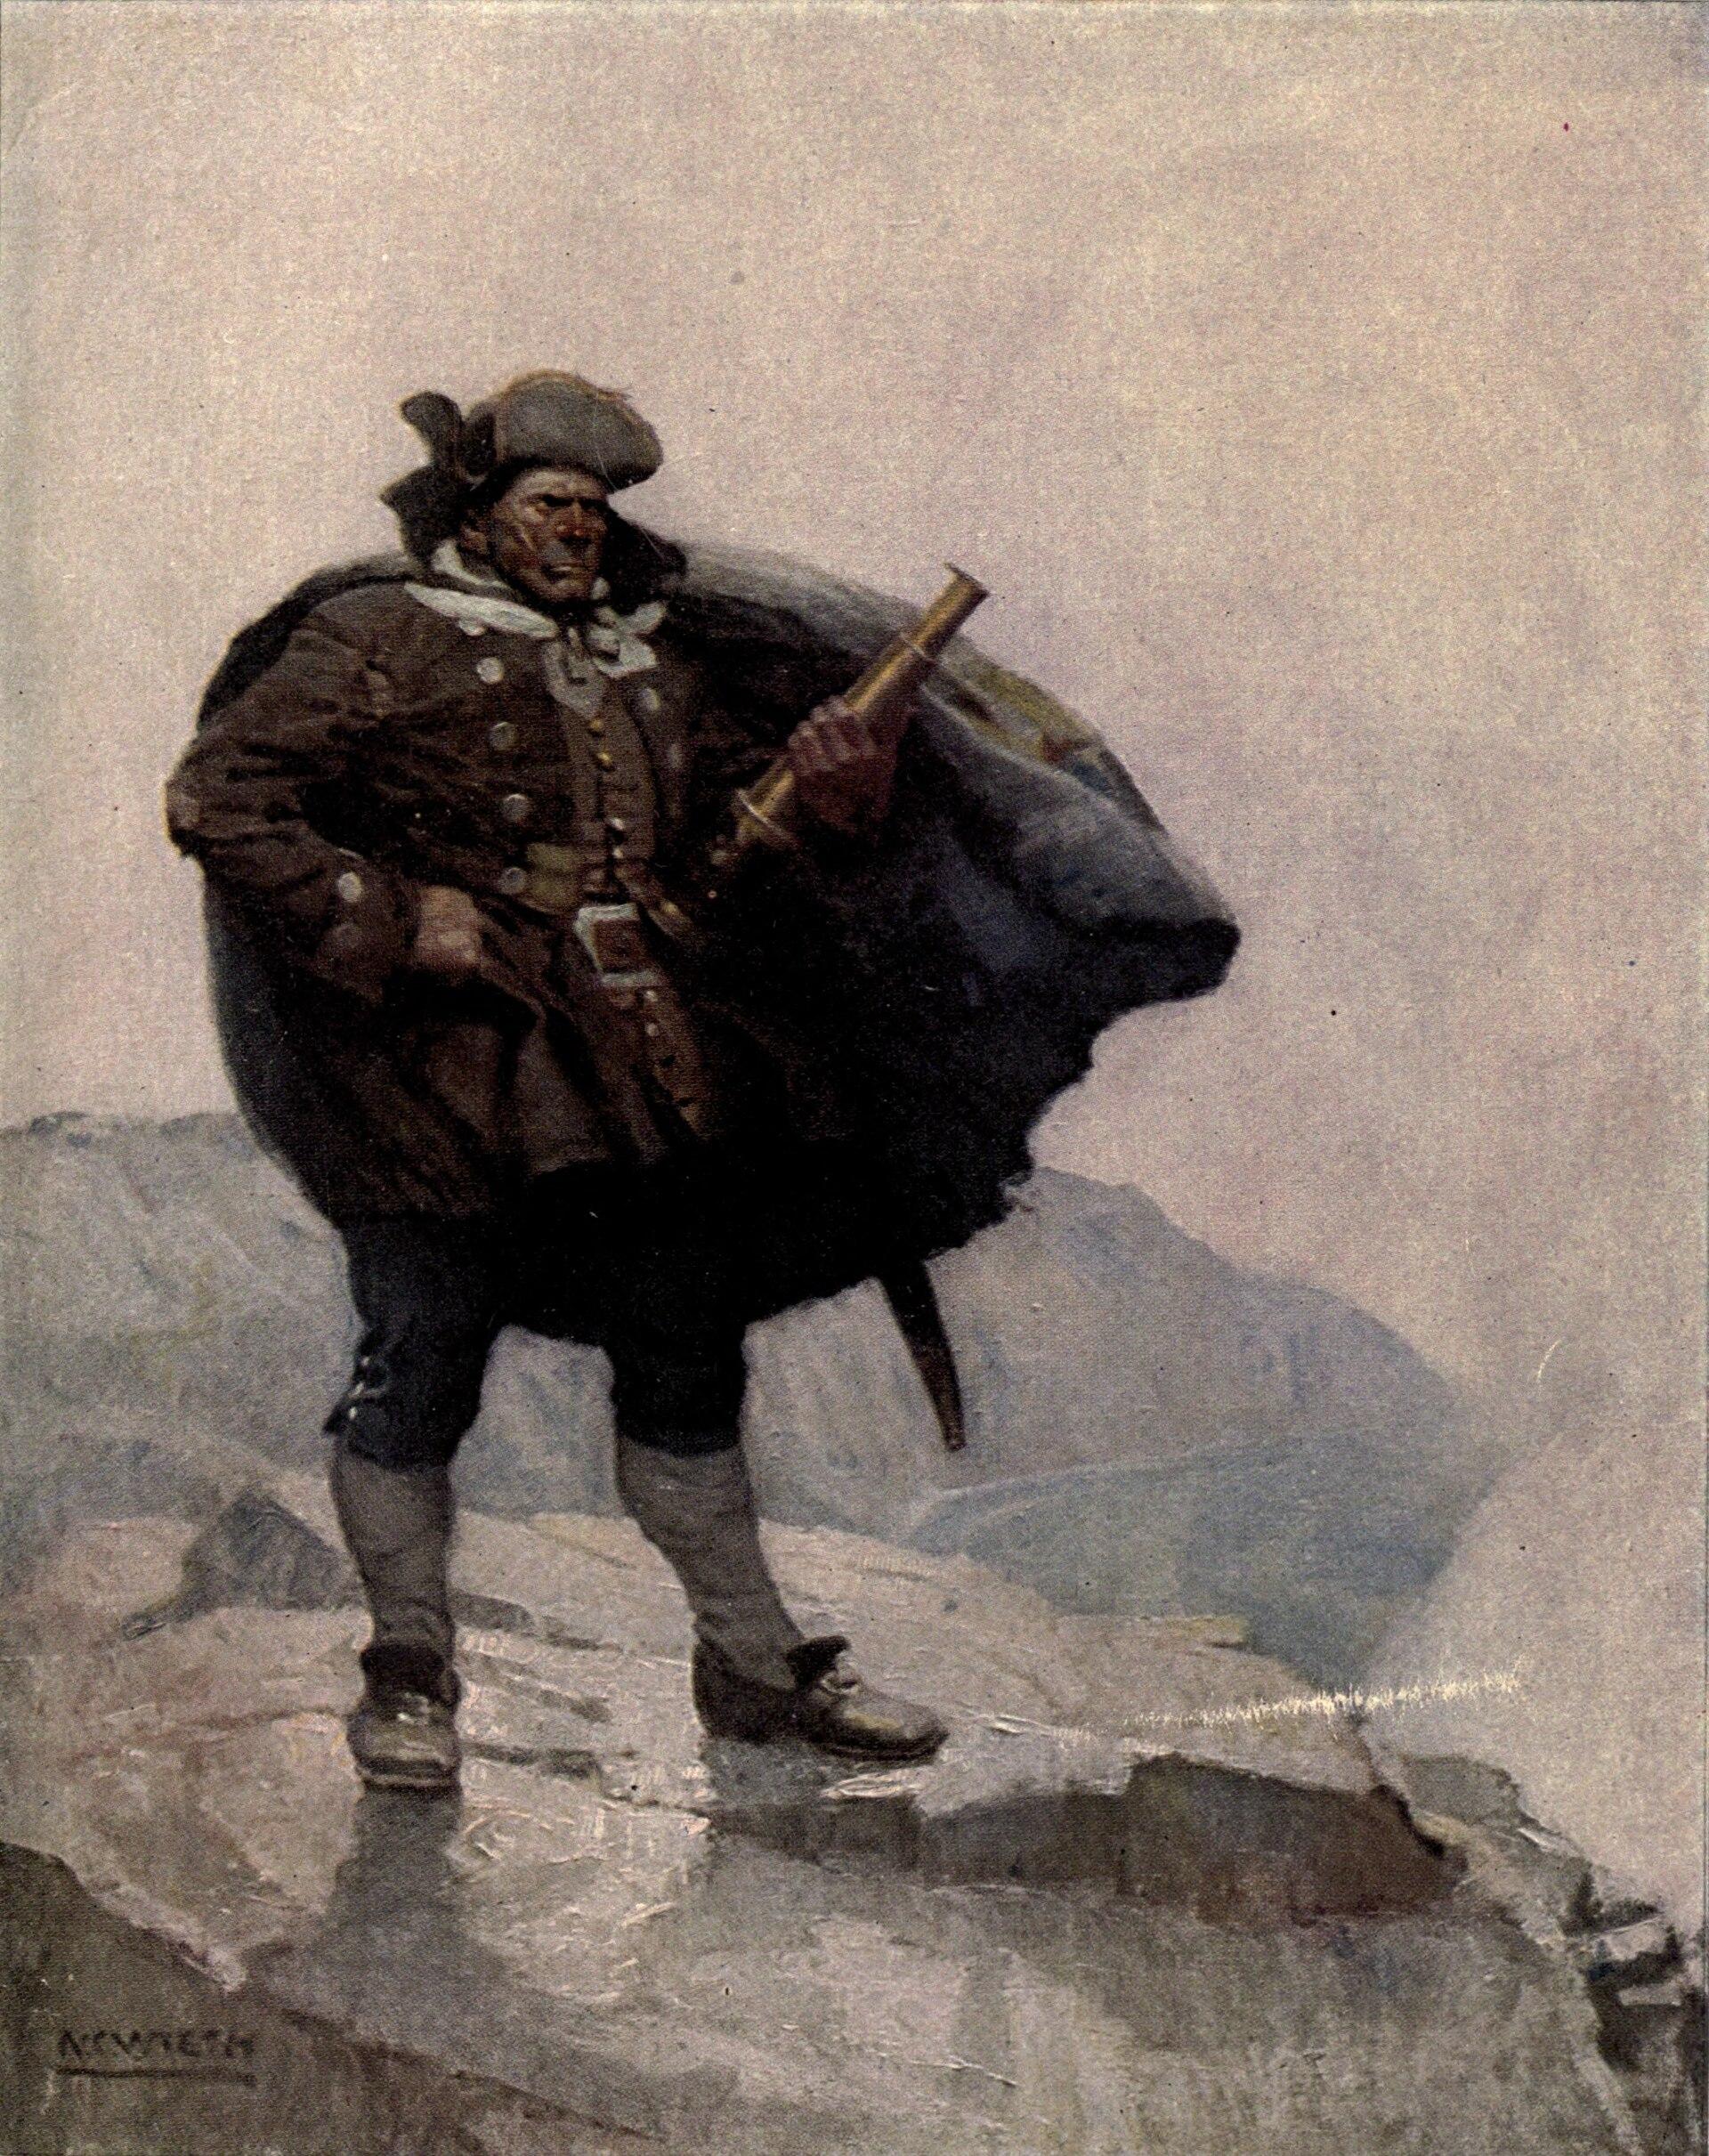 Treasure Island Robert Louis Stevenson Discussion